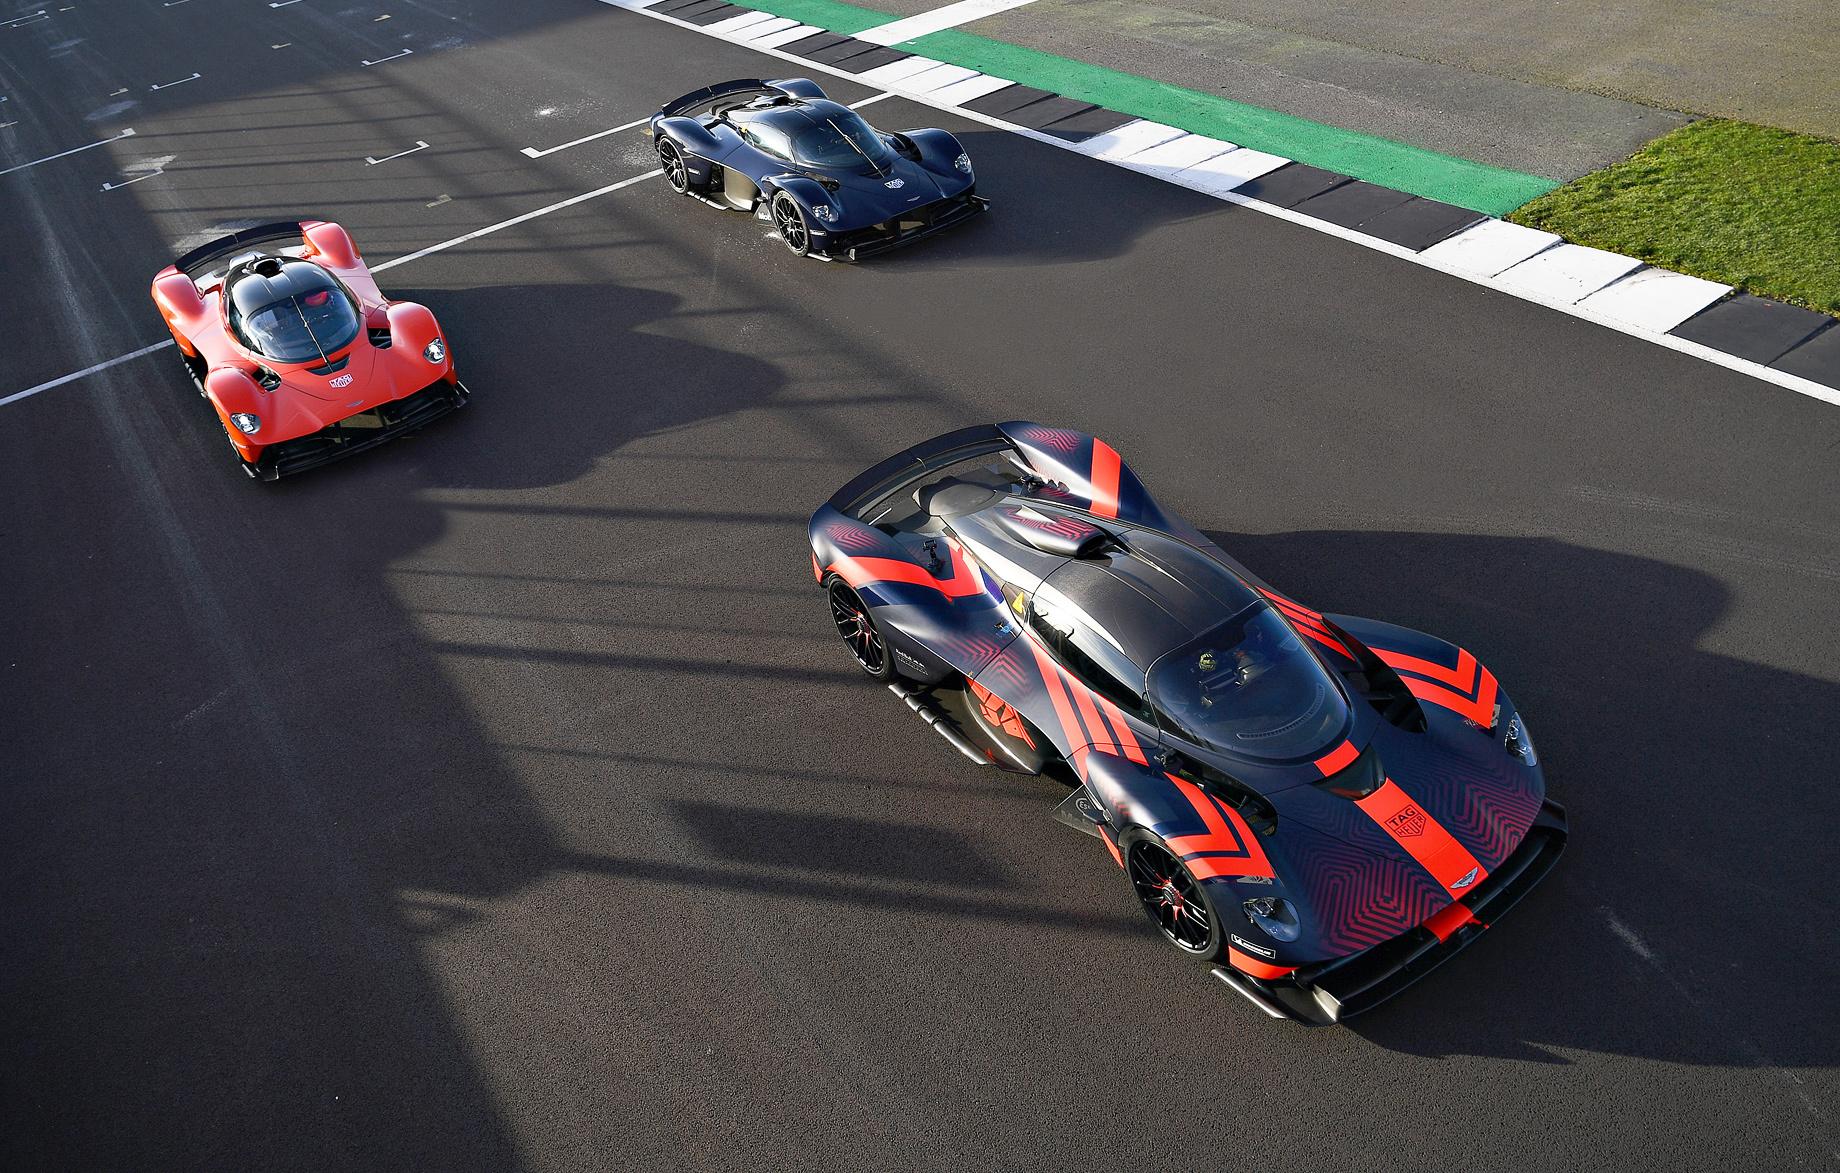 Гиперкар Aston Martin Valkyrie променяет Ле-Ман наФормулу-1